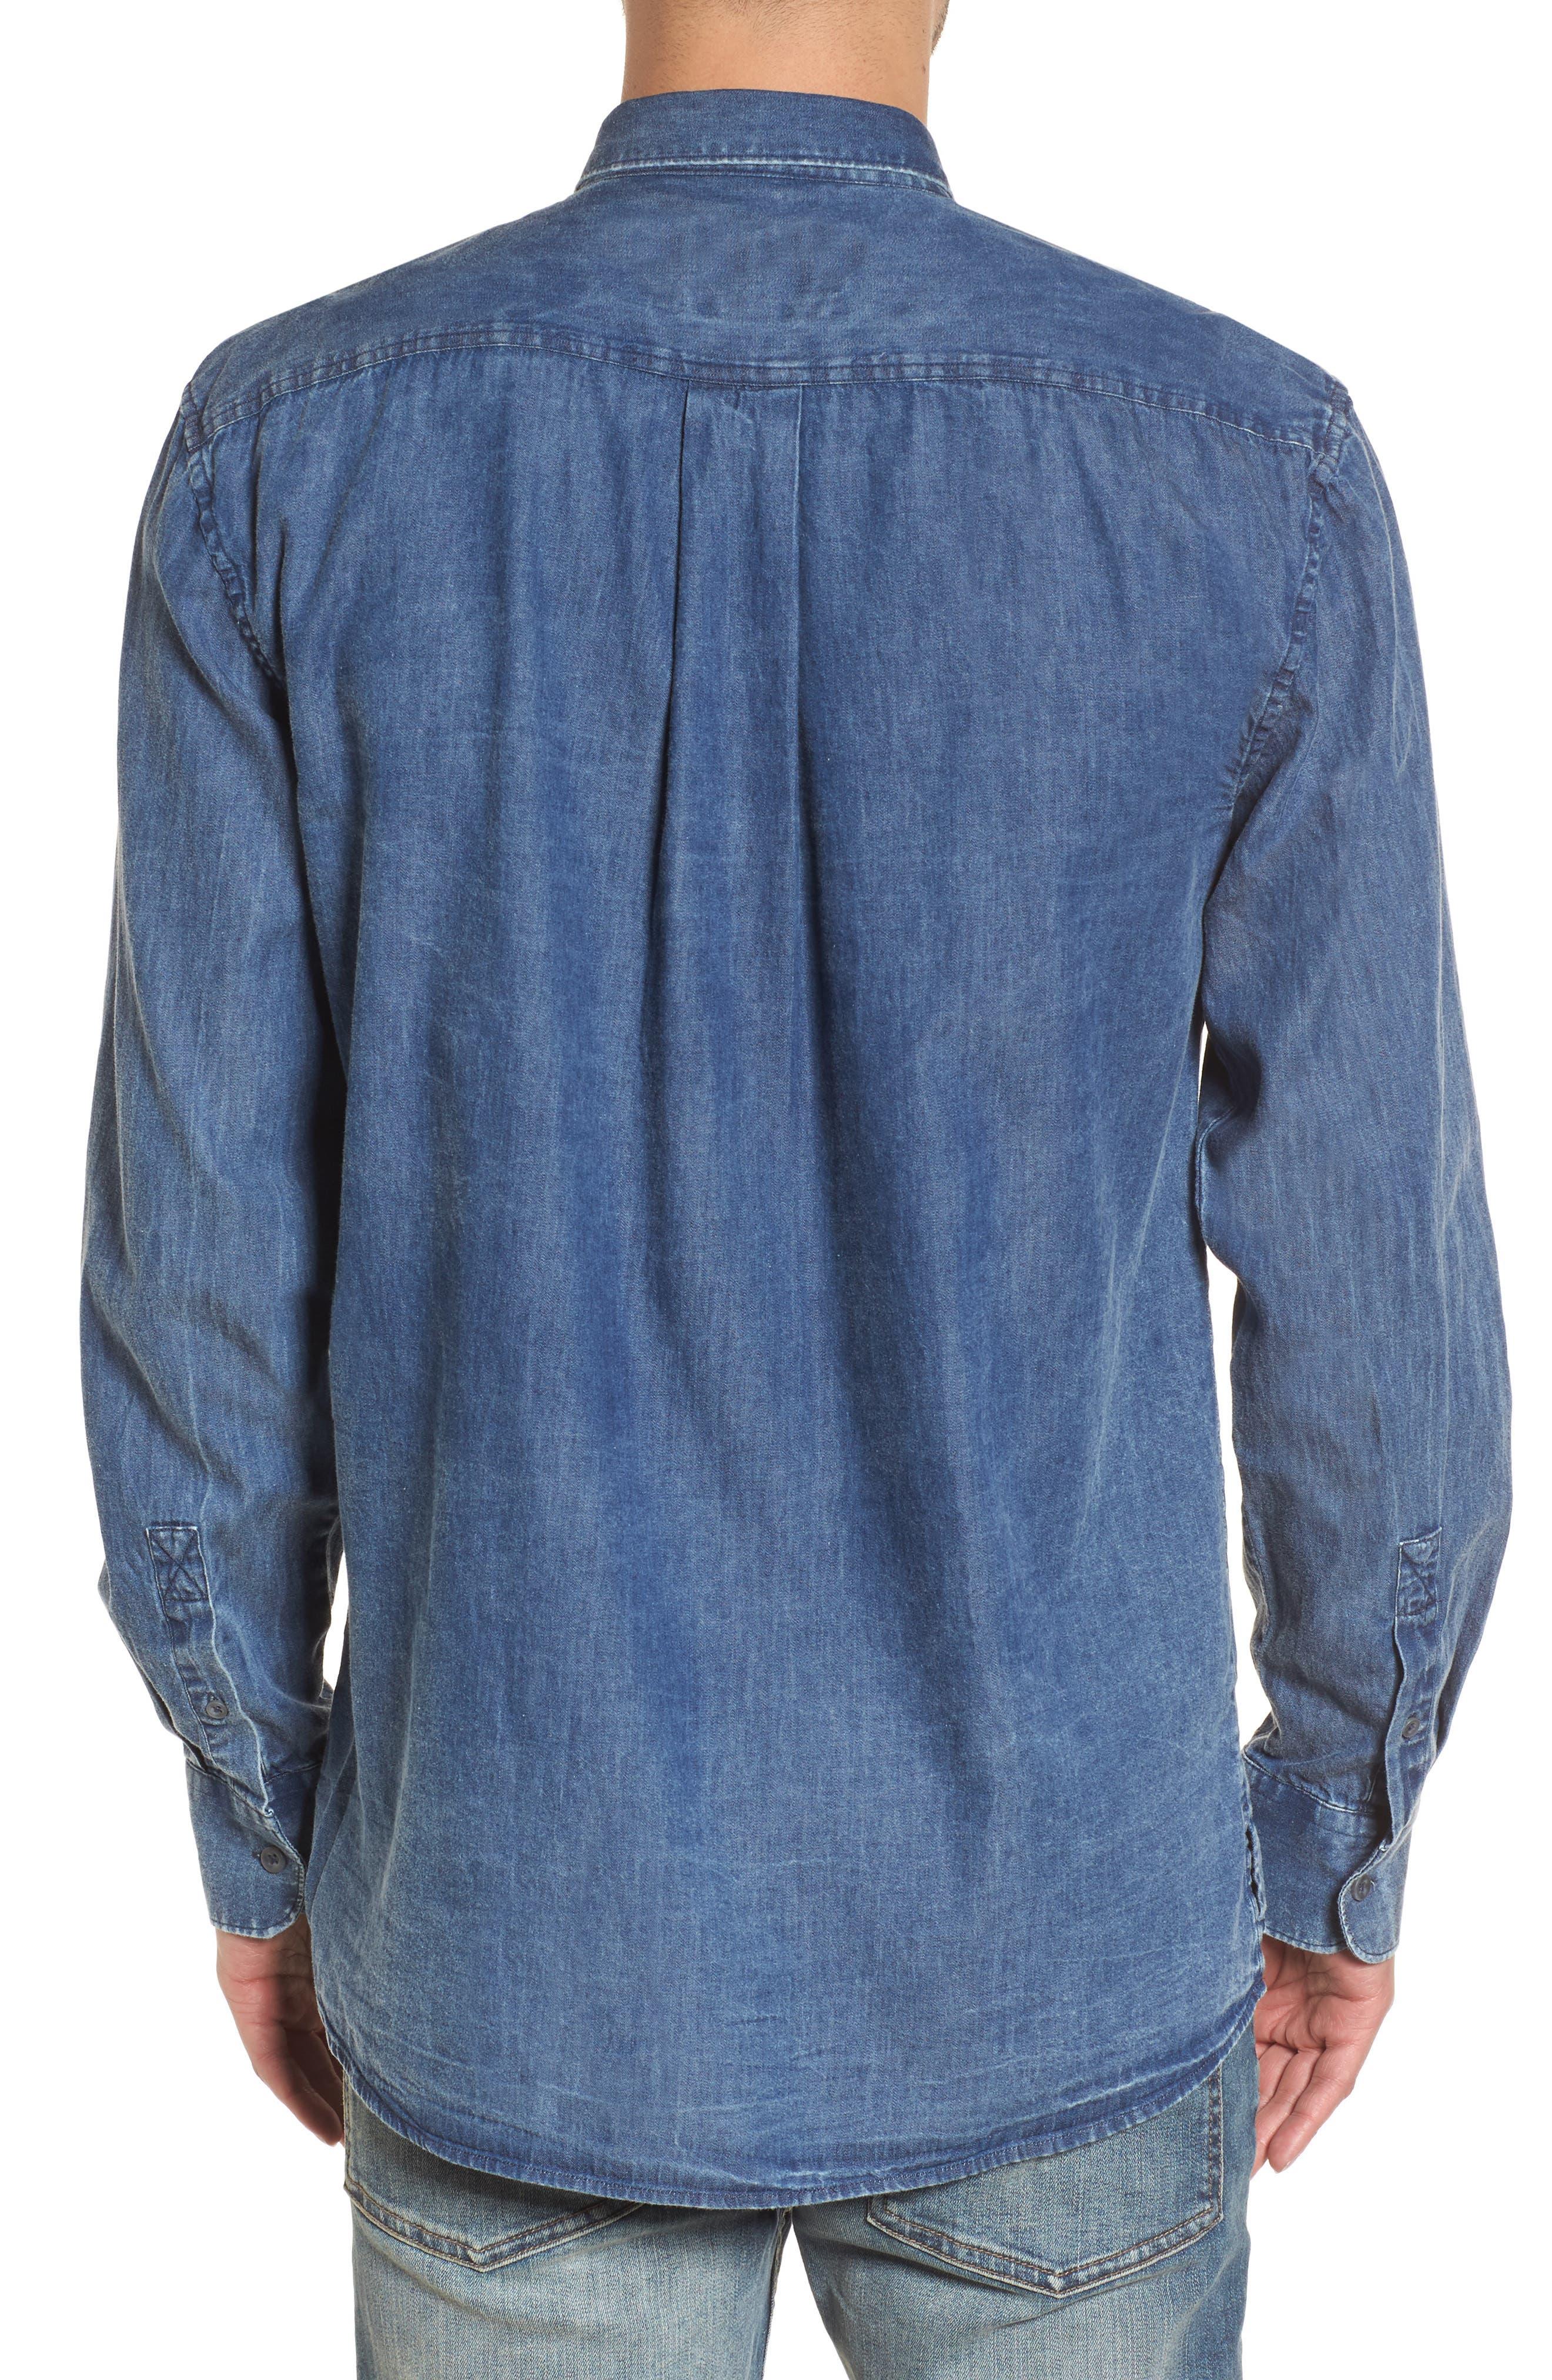 Boxy Denim Shirt,                             Alternate thumbnail 2, color,                             Vintage Navy Acid